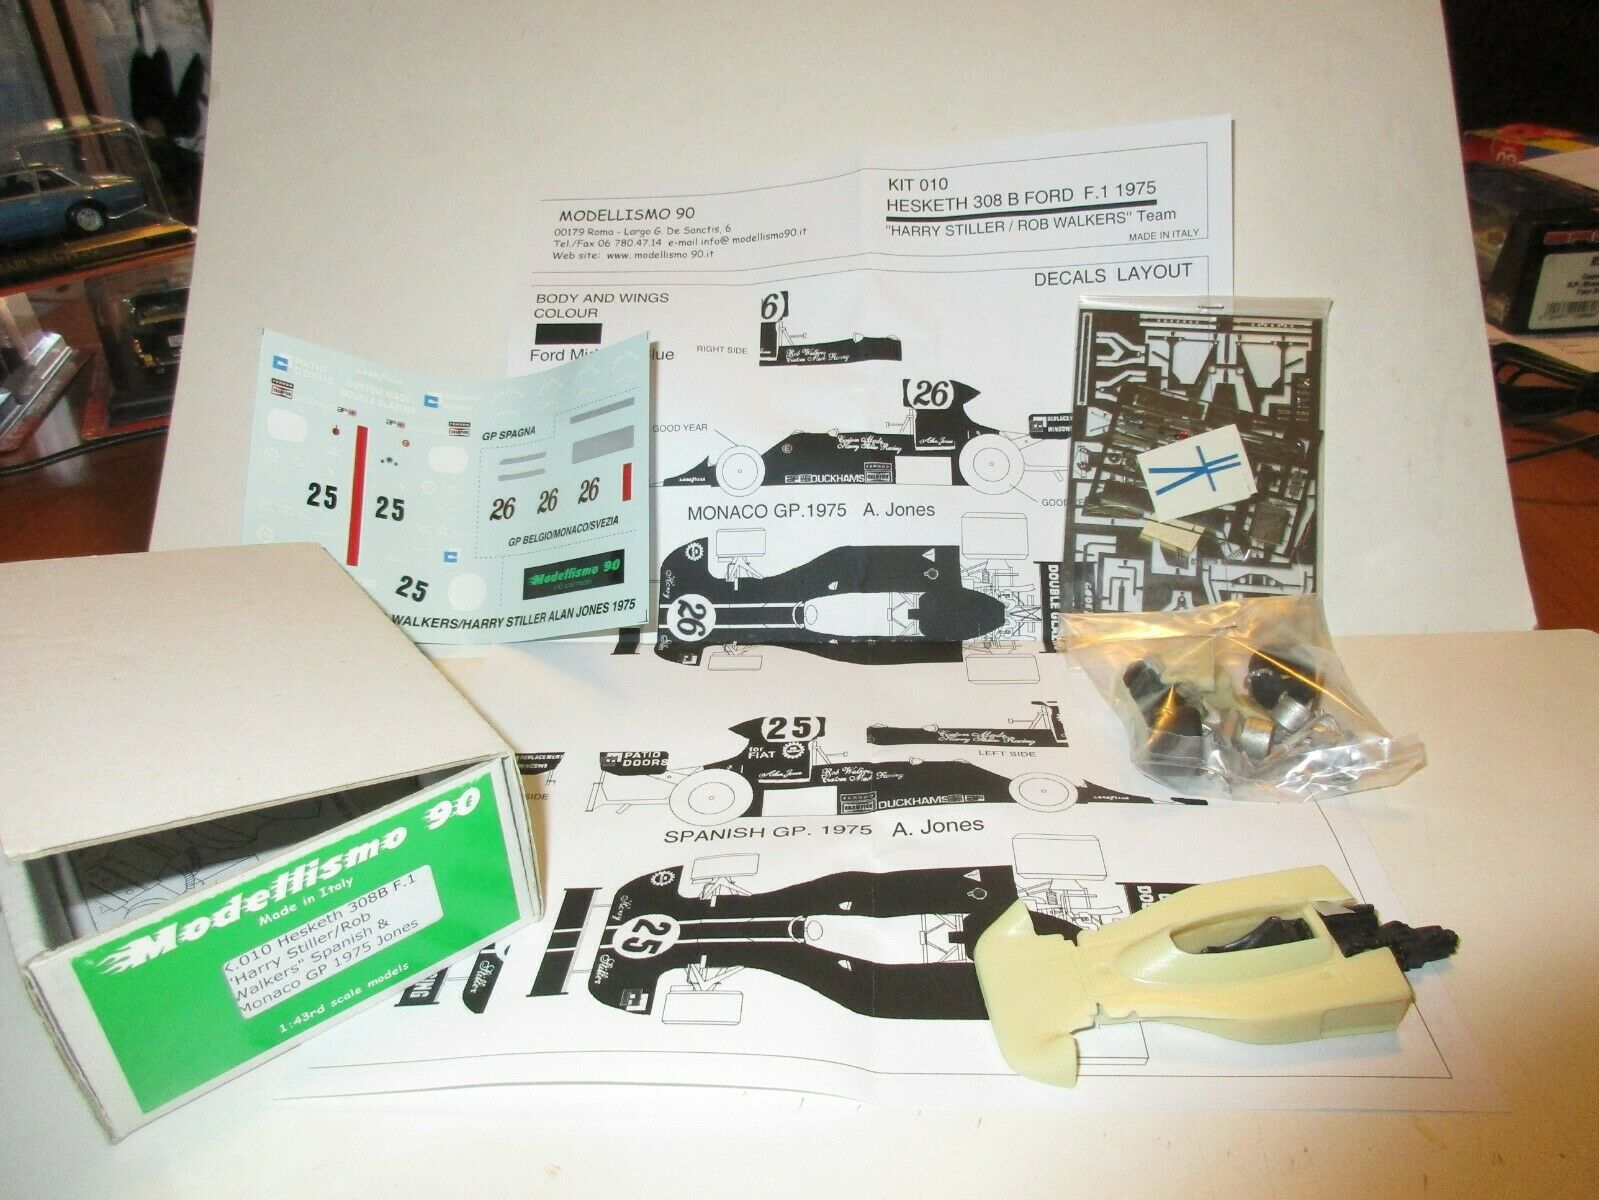 Hesketh 308b f1 Spain and Monaco GP 1975 Jones Kit Model 90 1 43 K 010